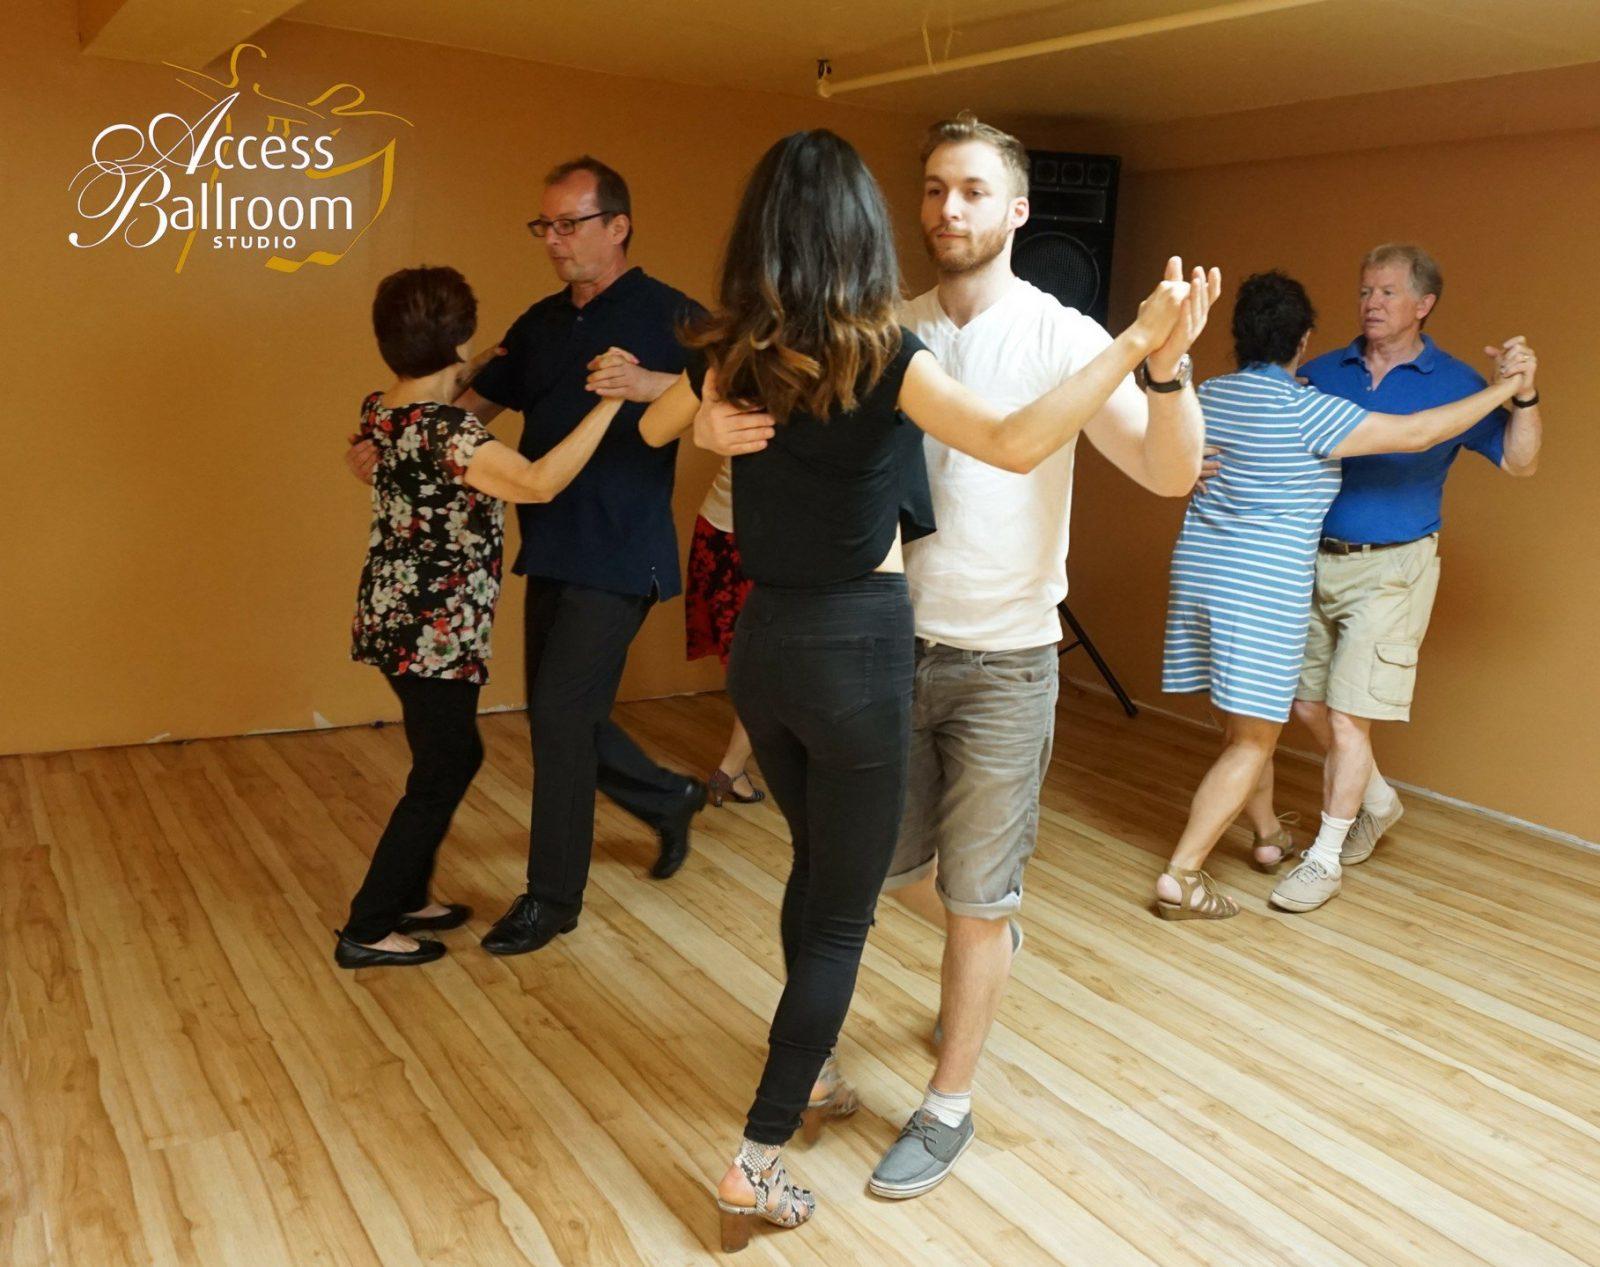 group tango lesson class four couples dancing dance teacher instructor gil bynoe access ballroom studio toronto beaches dance school how to dress for ballroom dance class